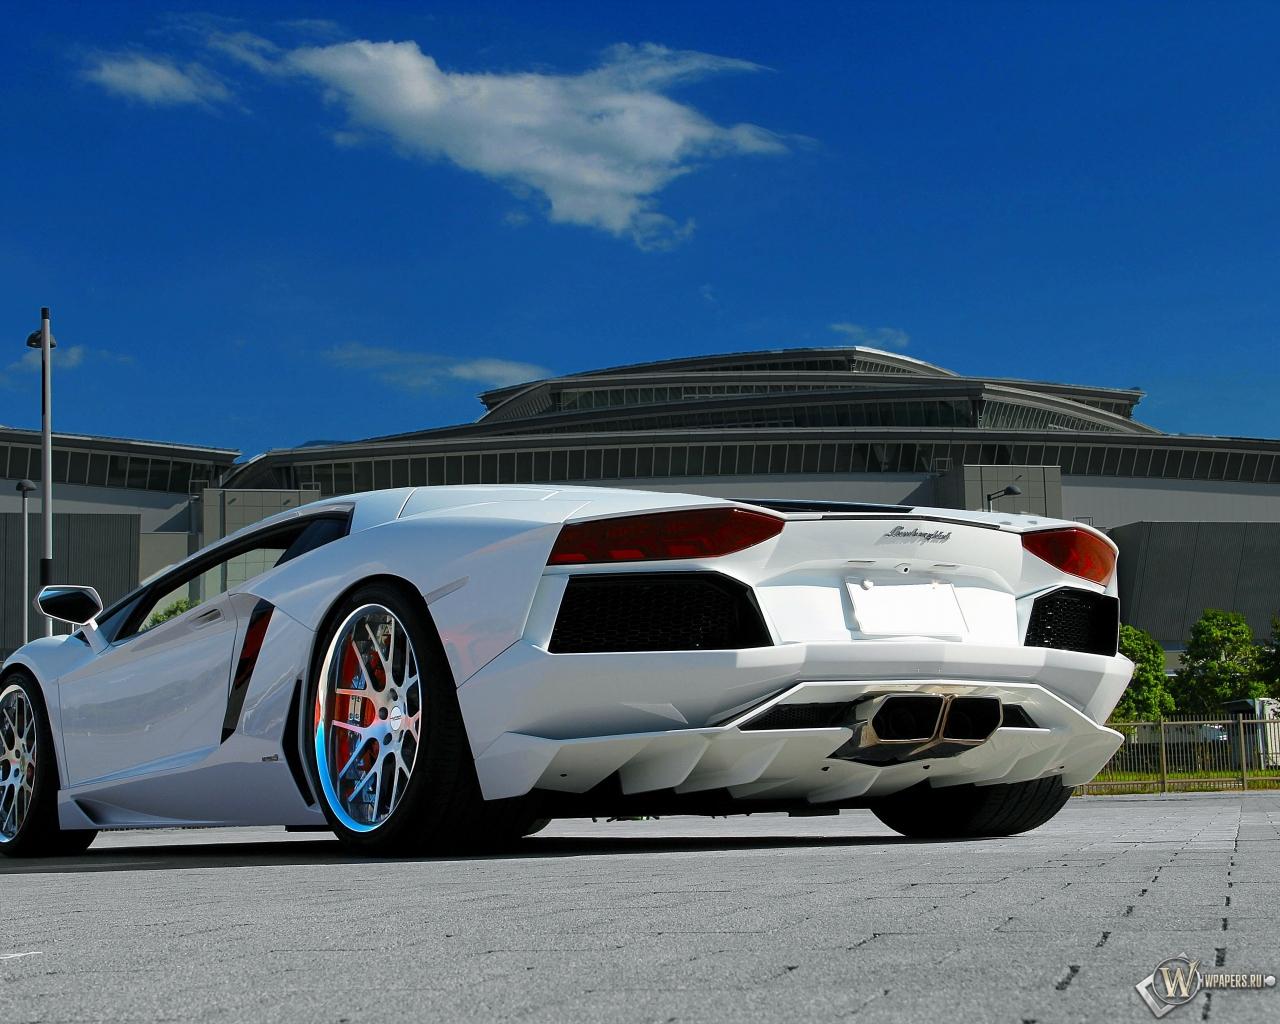 Lamborghini Aventador 1280x1024